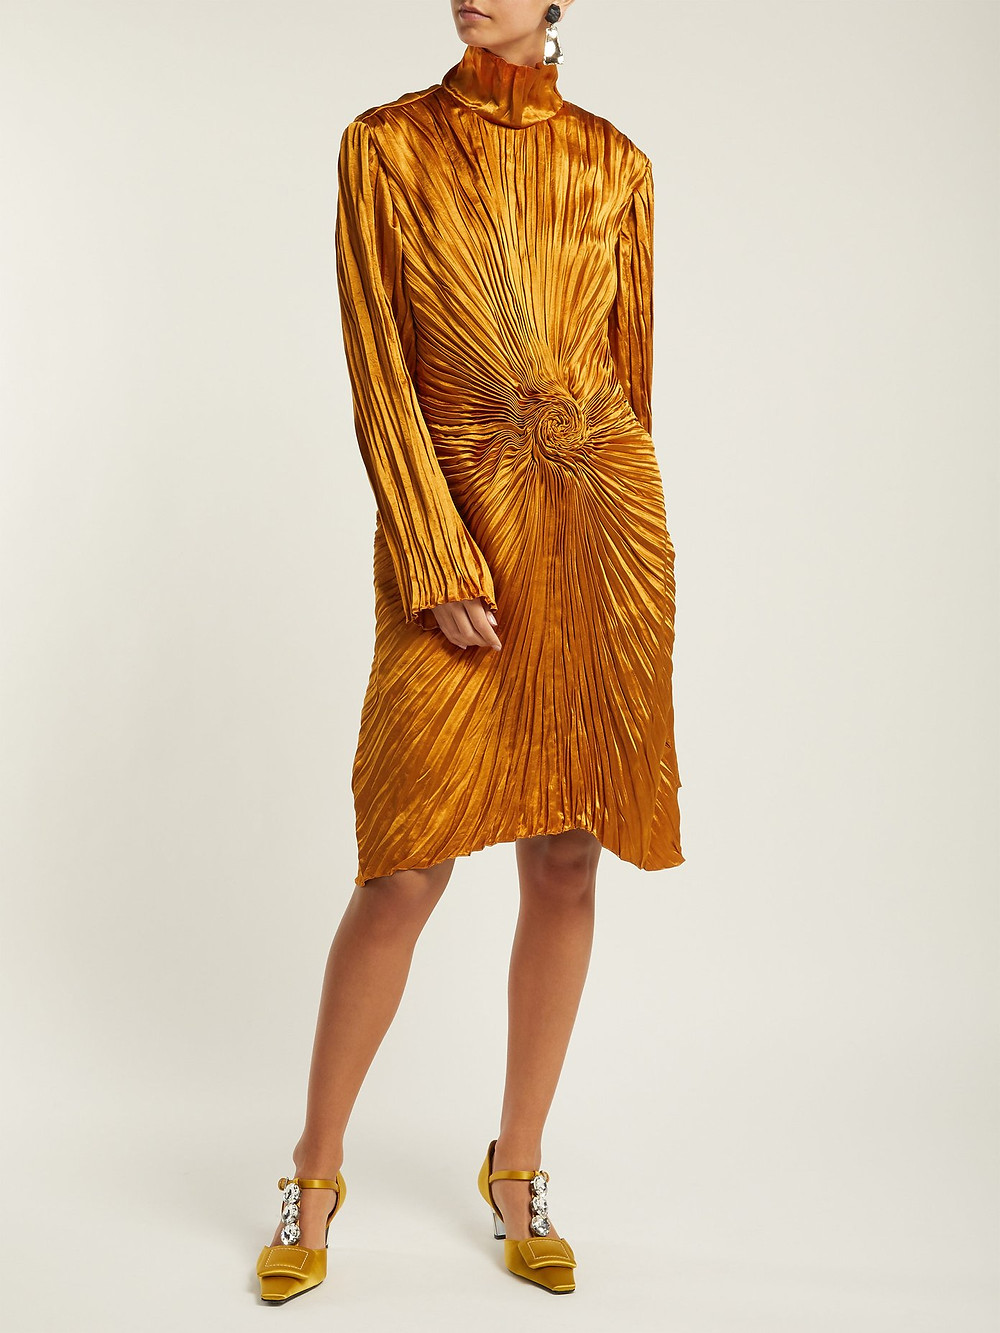 Sies Marjan Ida pleated satin dress $2,295